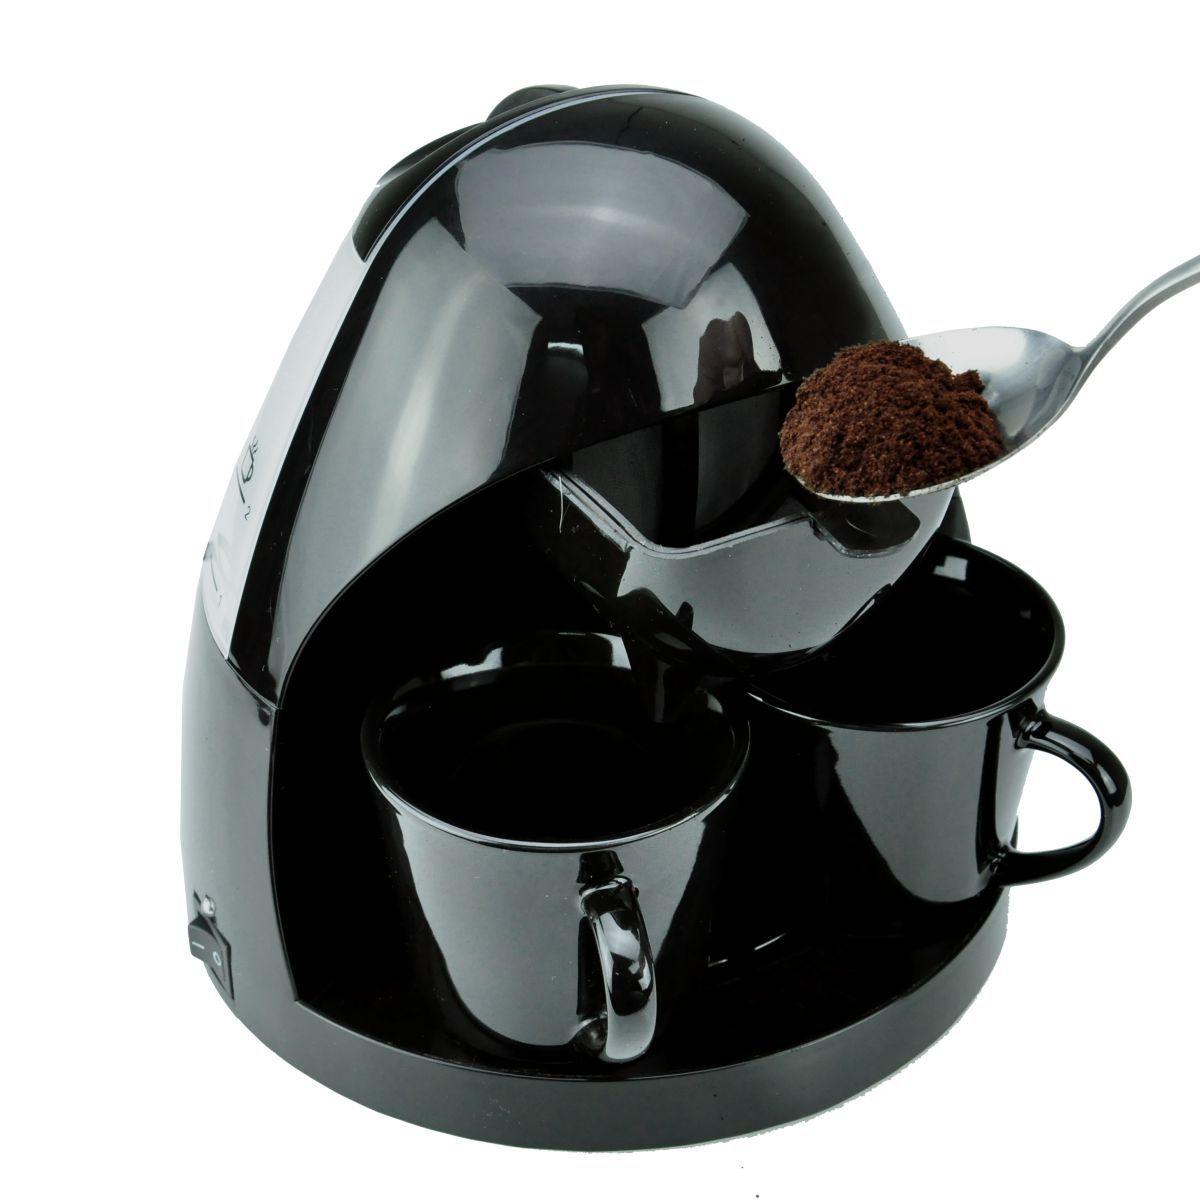 где купить Coffee Machine Tea Machine Drip Type Automatic Home Insulation American Coffee Tea Machine Small Household Appliances Wholesale по лучшей цене